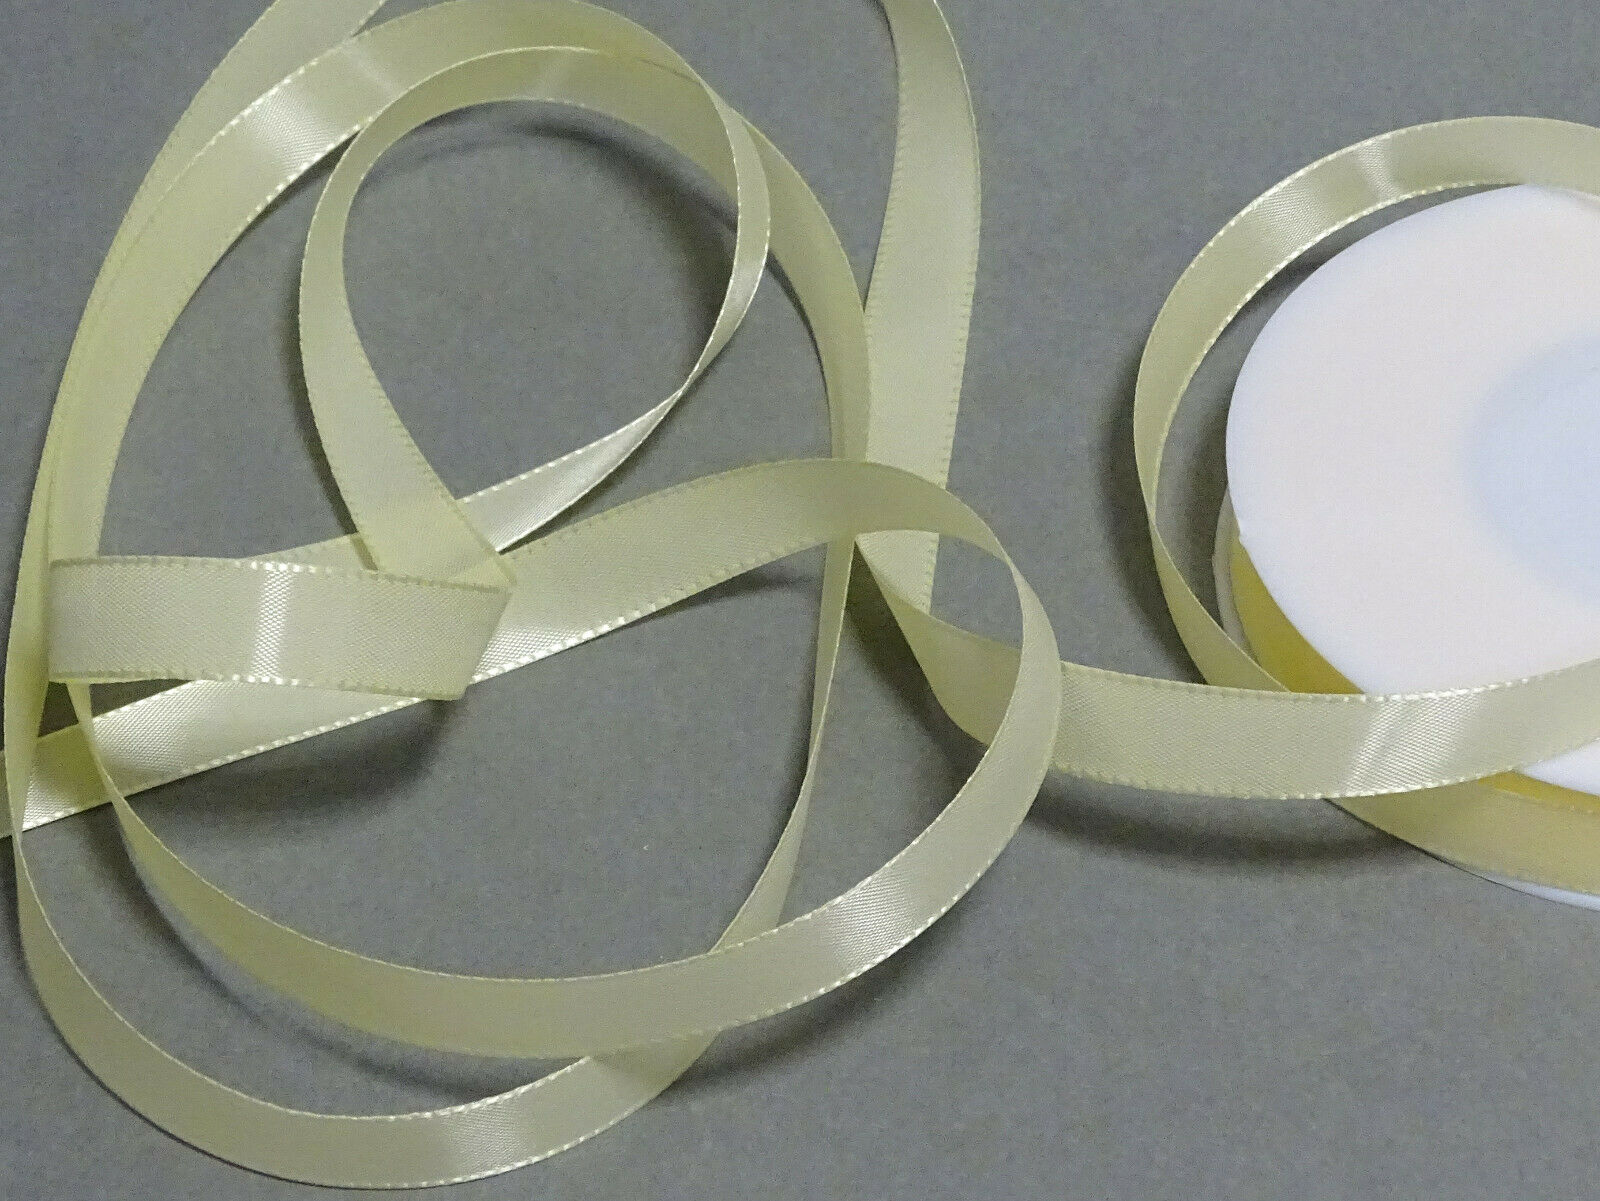 Seidenband Schleifenband 50 m x 15 / 25 / 40mm Dekoband ab 0,08€/m Geschenkband  - Creme 105, 40 mm x 50 m